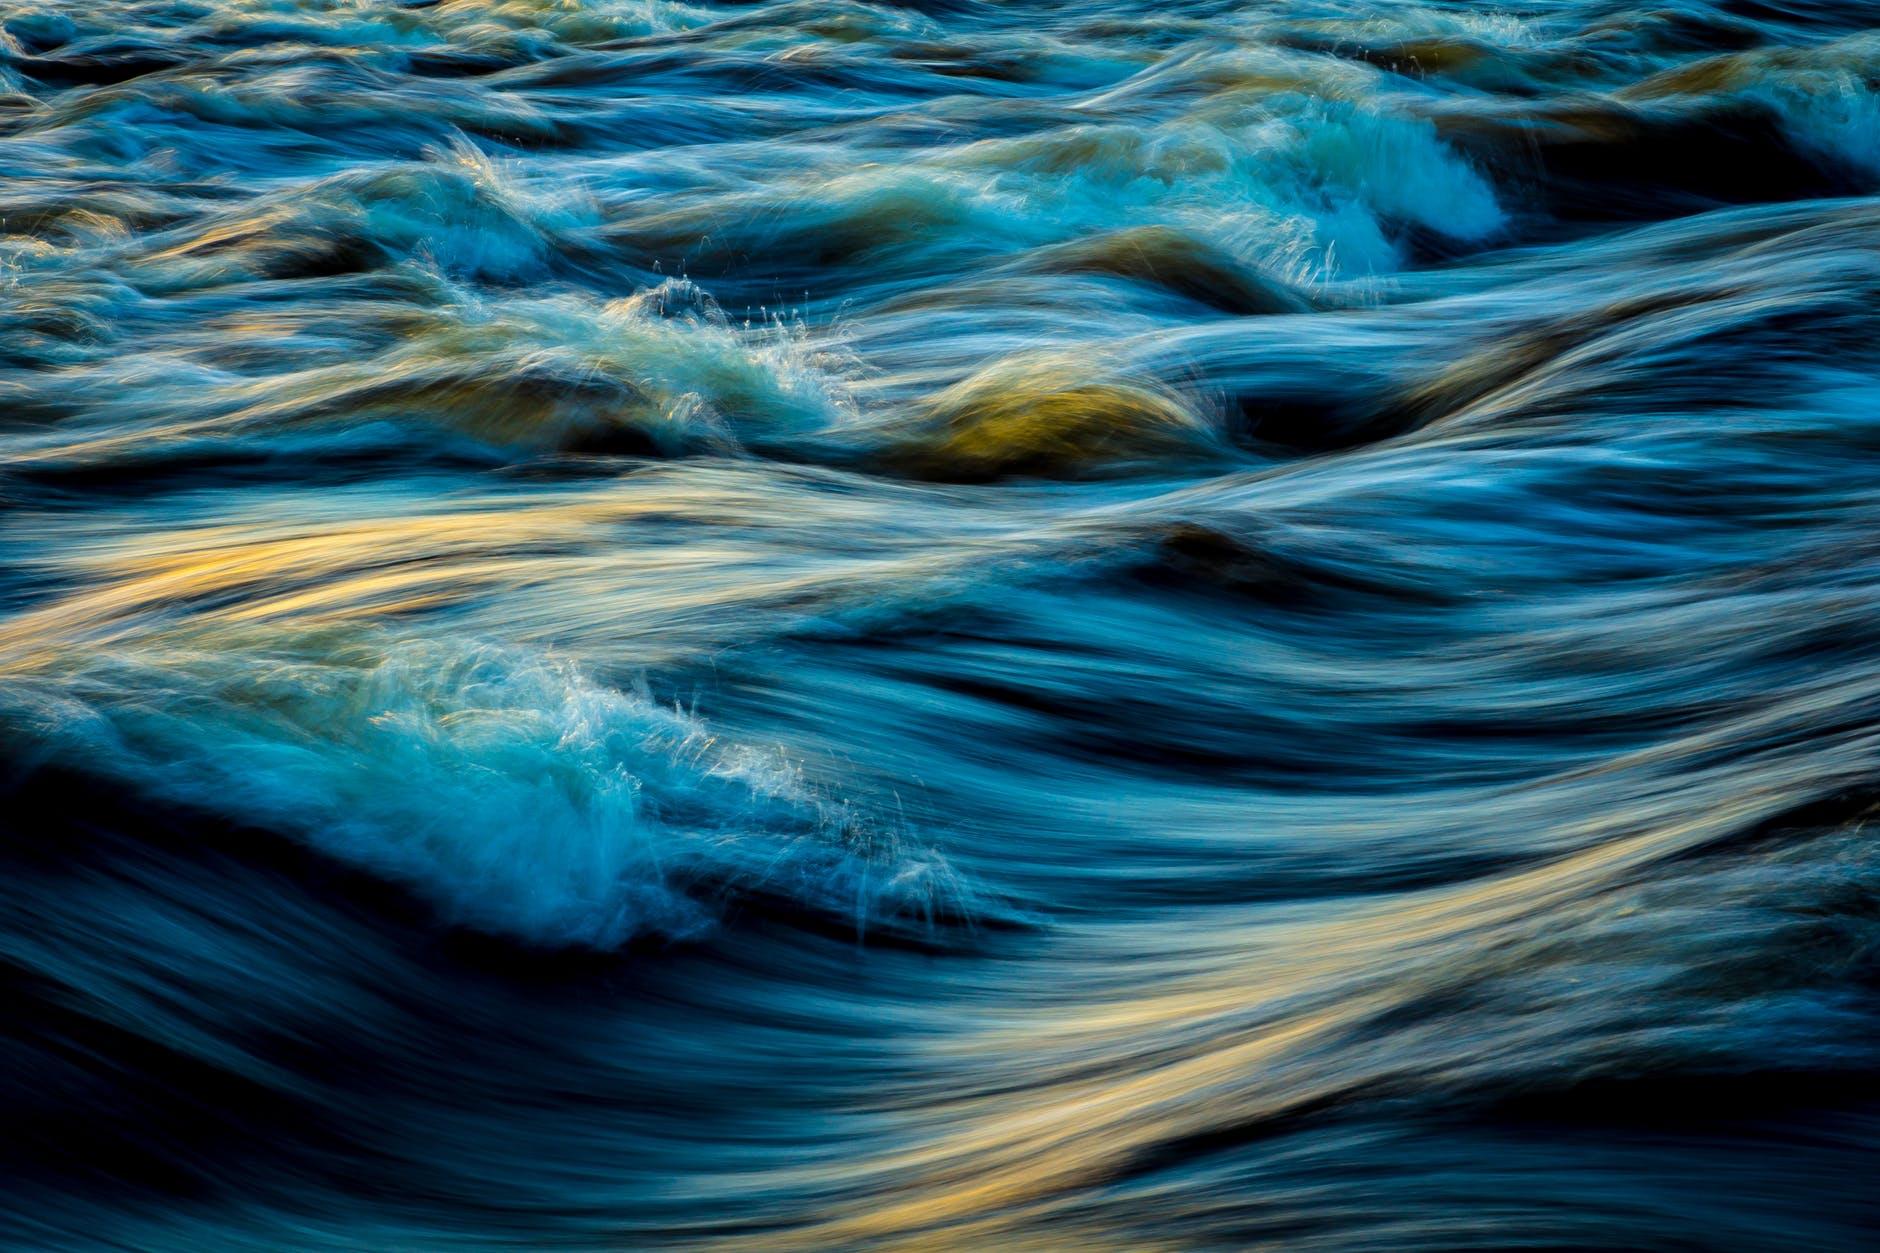 macro photography of water waves